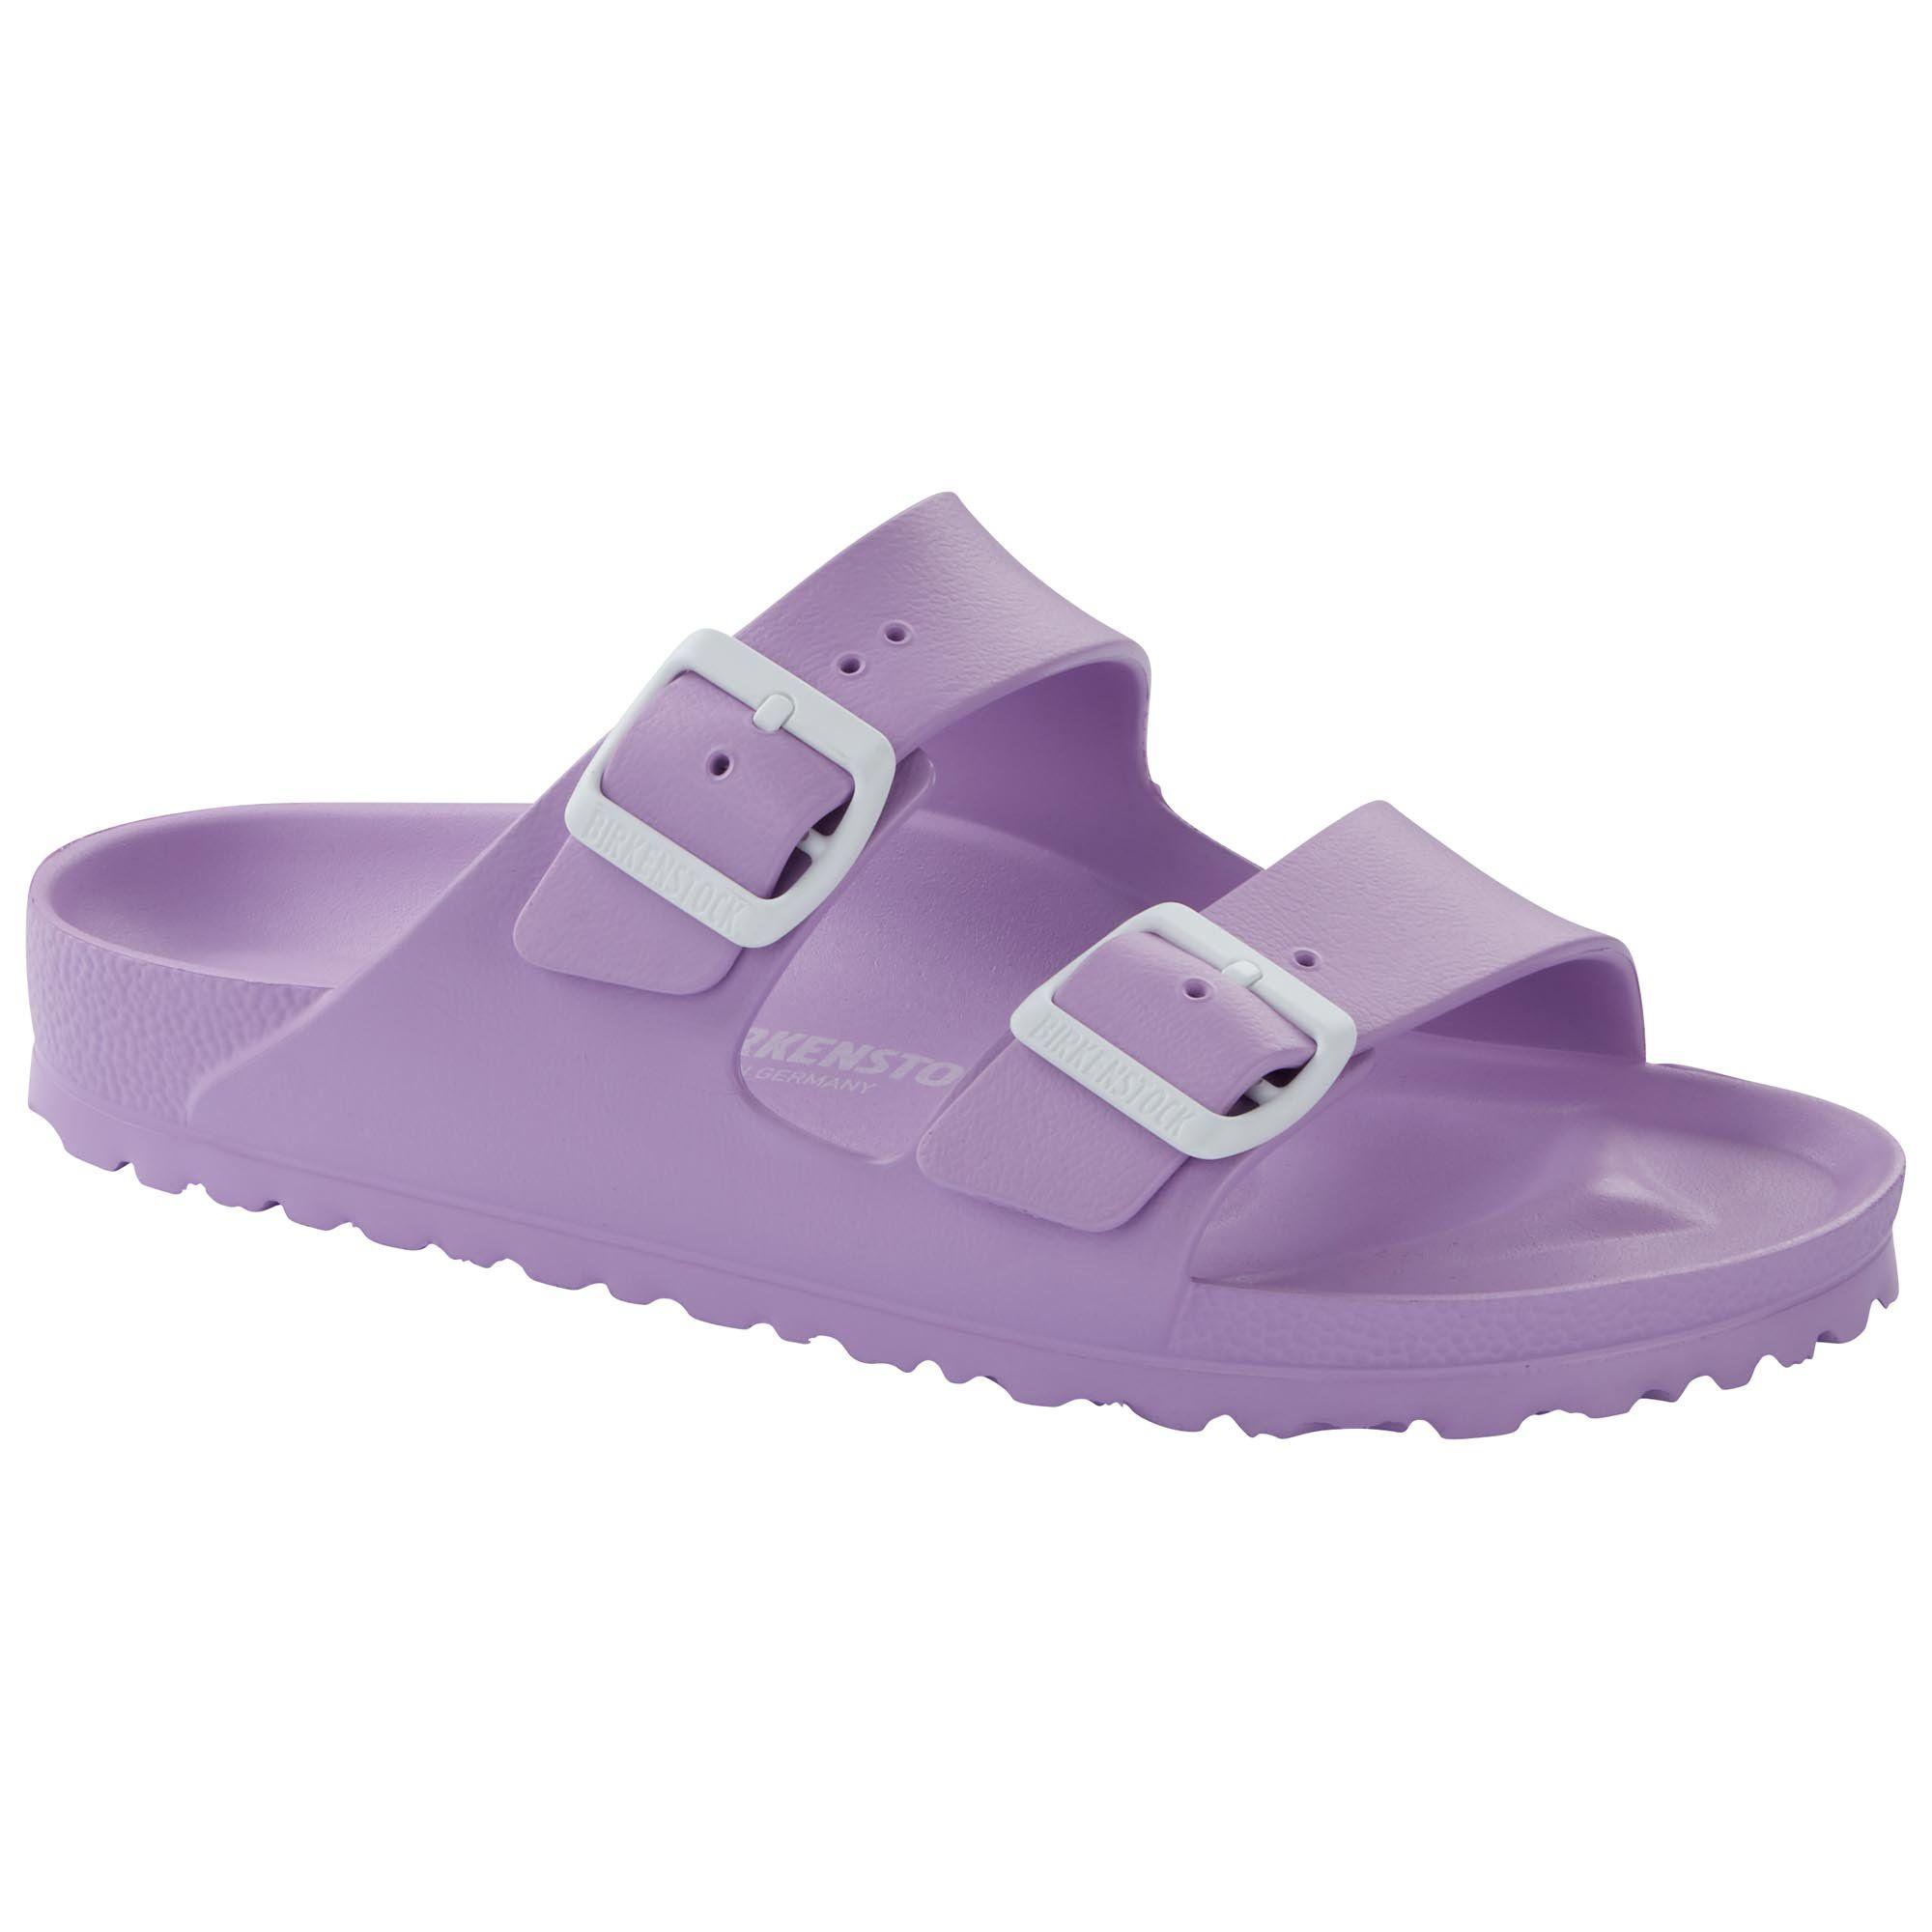 Arizona EVA Lavender   shop online at